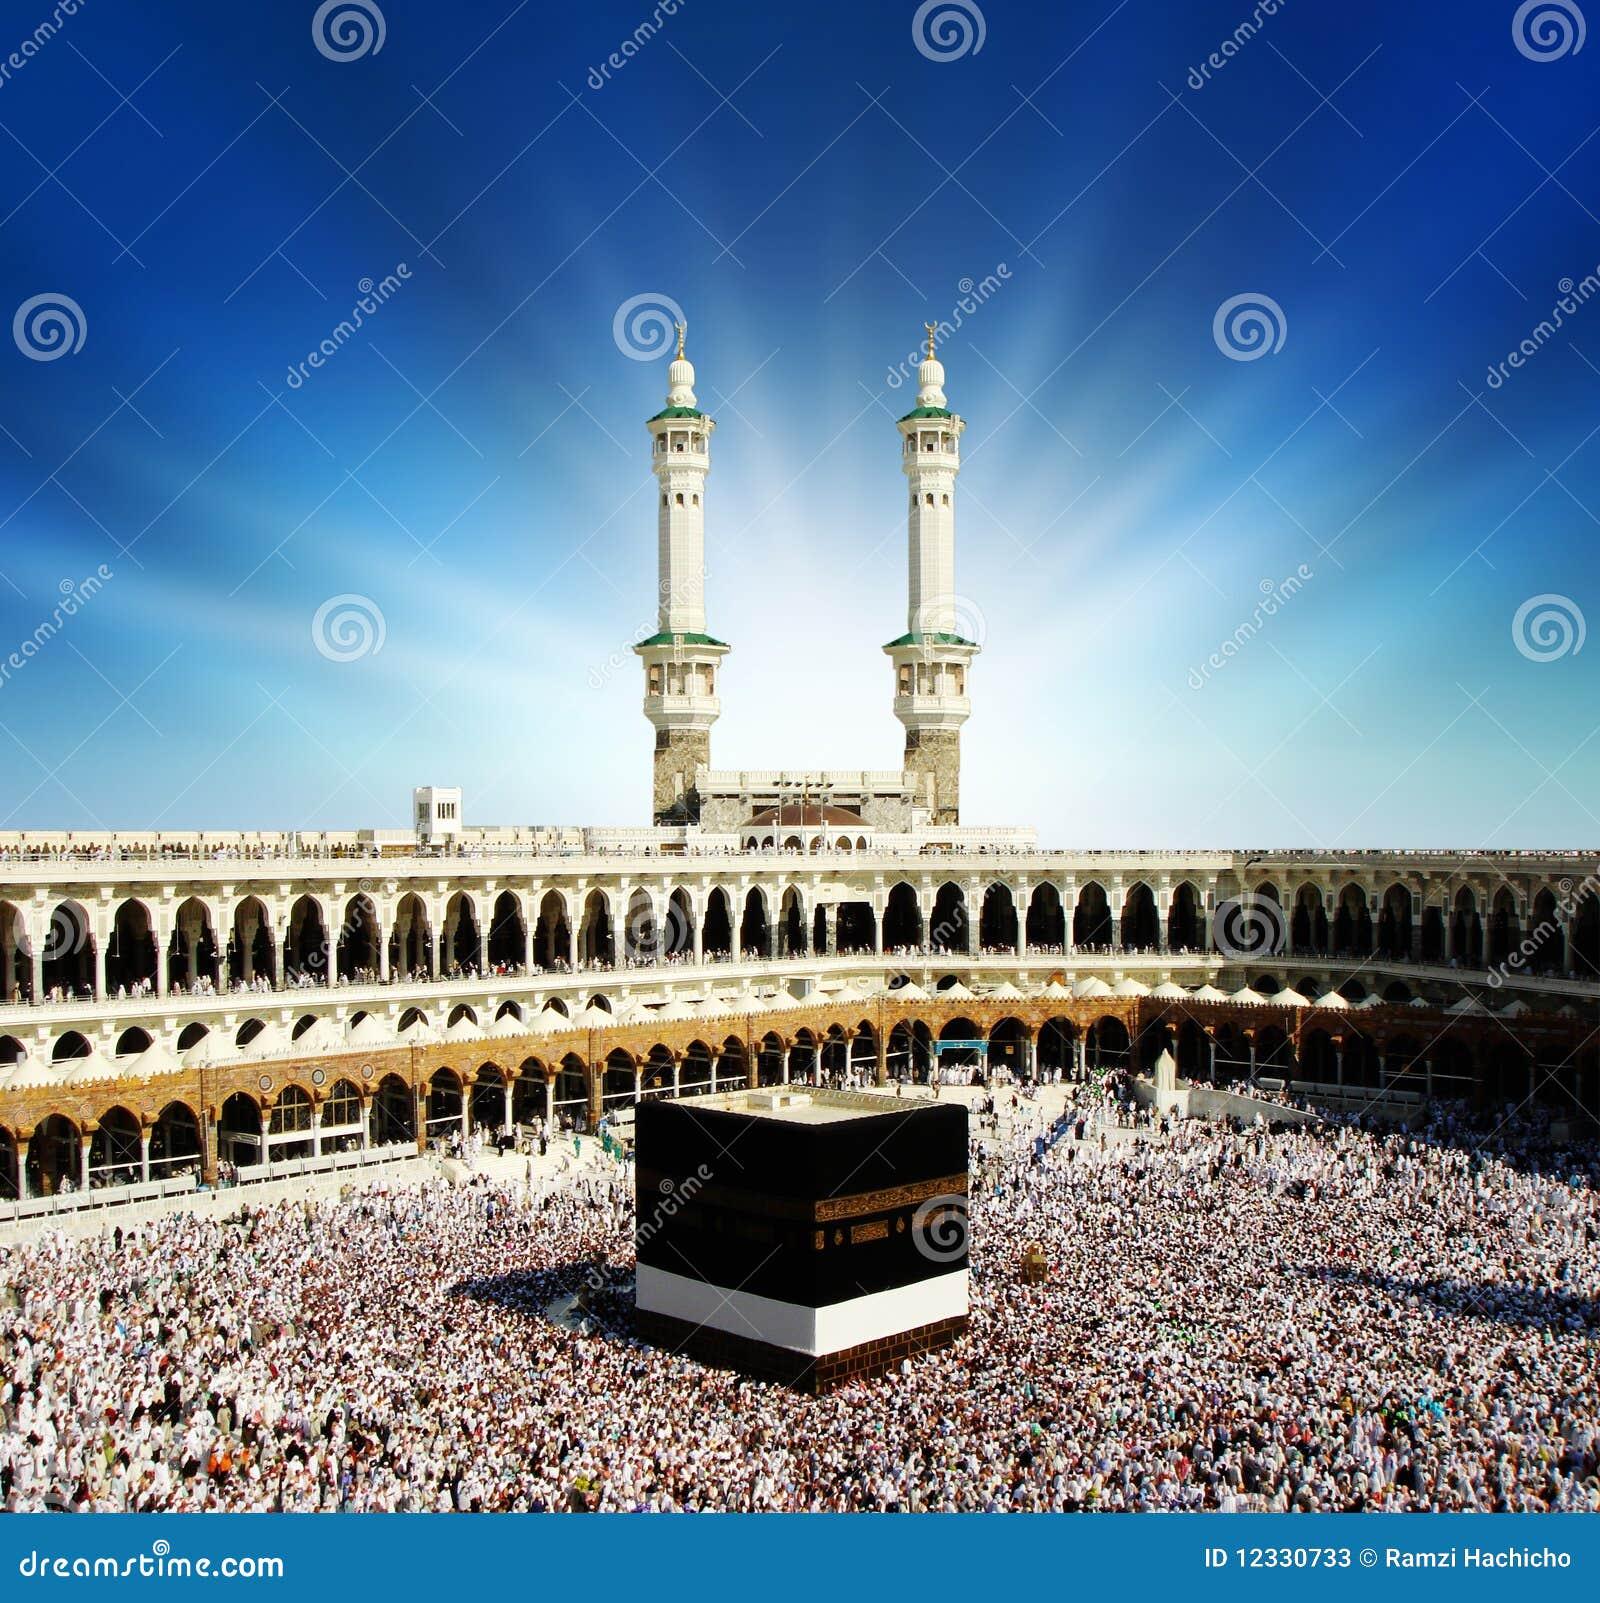 My islam house i provide you free islamic knowledge. : makkah.